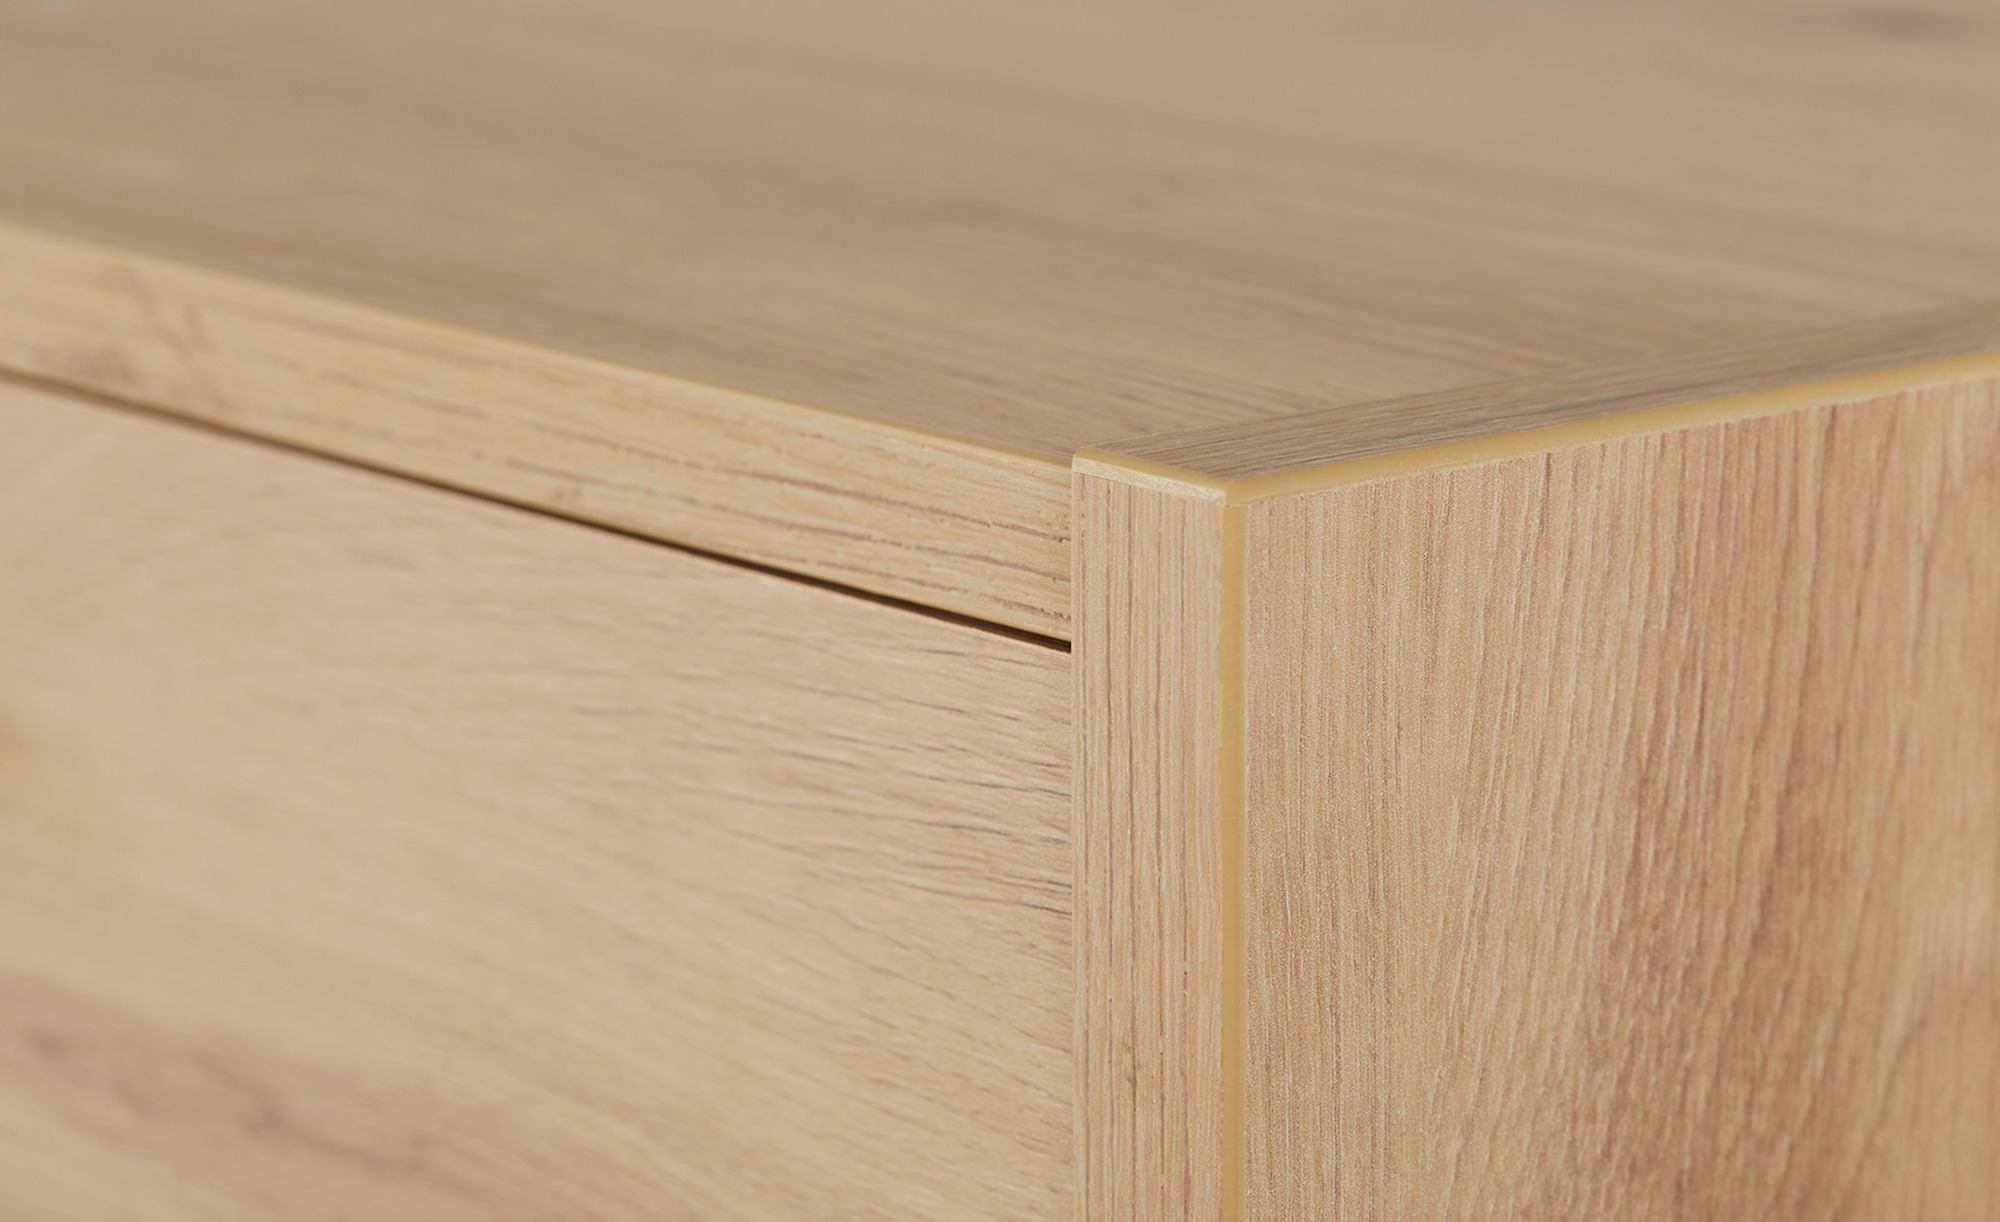 Sideboard  Nisio ¦ holzfarben ¦ Maße (cm): B: 153 H: 80,5 T: 35 Kommoden & Sideboards > Kommoden - Höffner